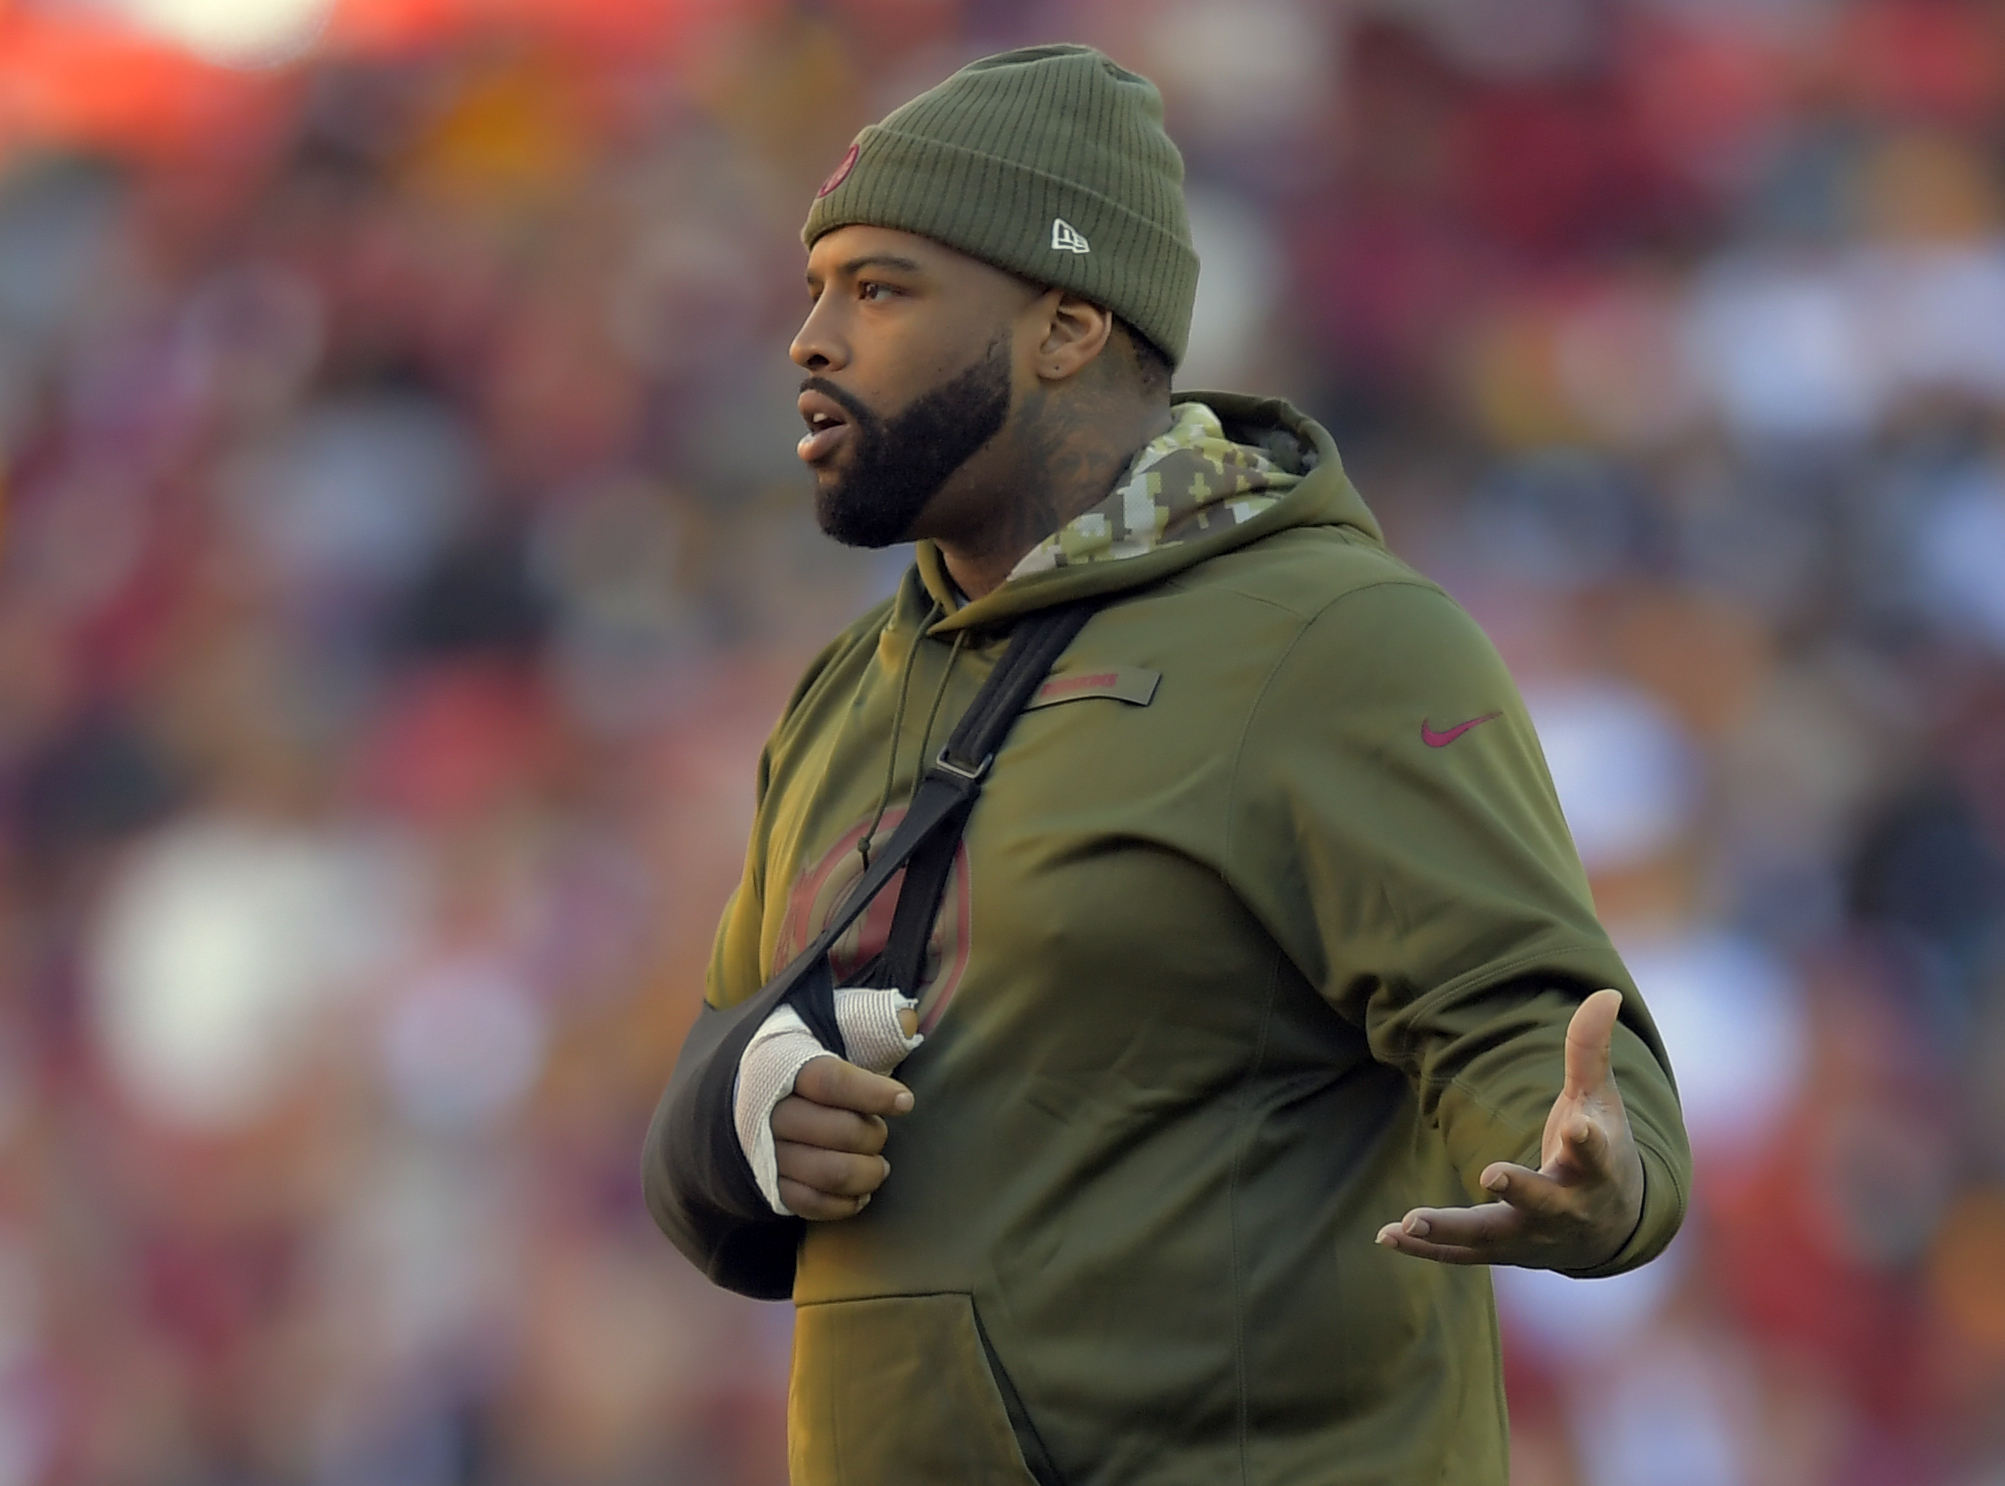 Washington Redskins and the Atlanta Falcons